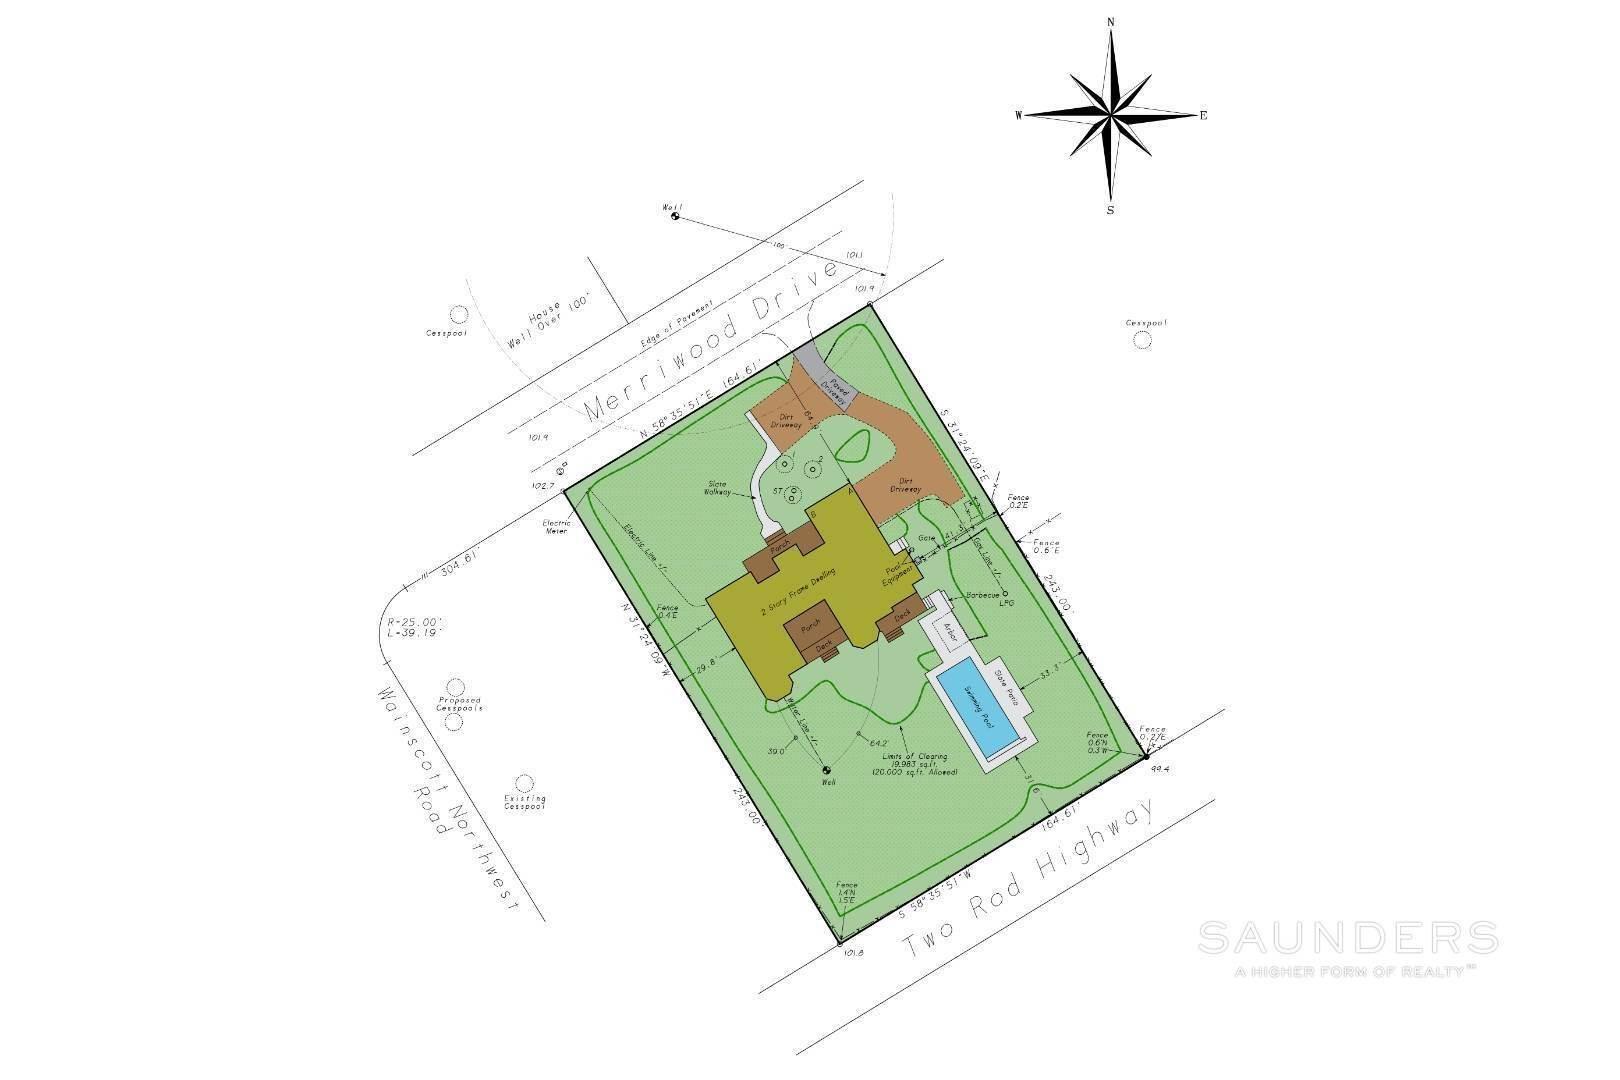 25. Single Family Homes for Sale at Wainscott South Traditional Near Beach Lane 10 Merriwood Drive, Wainscott, East Hampton Town, NY 11975